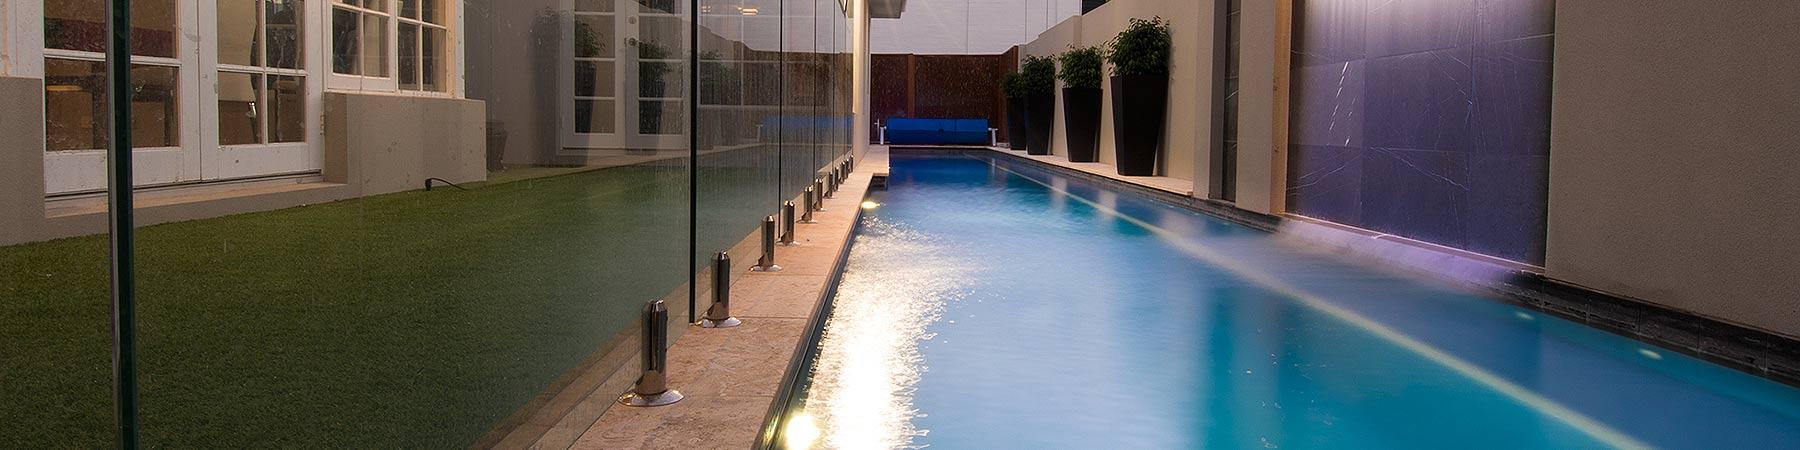 Concrete-Lap-Pool-Applecross